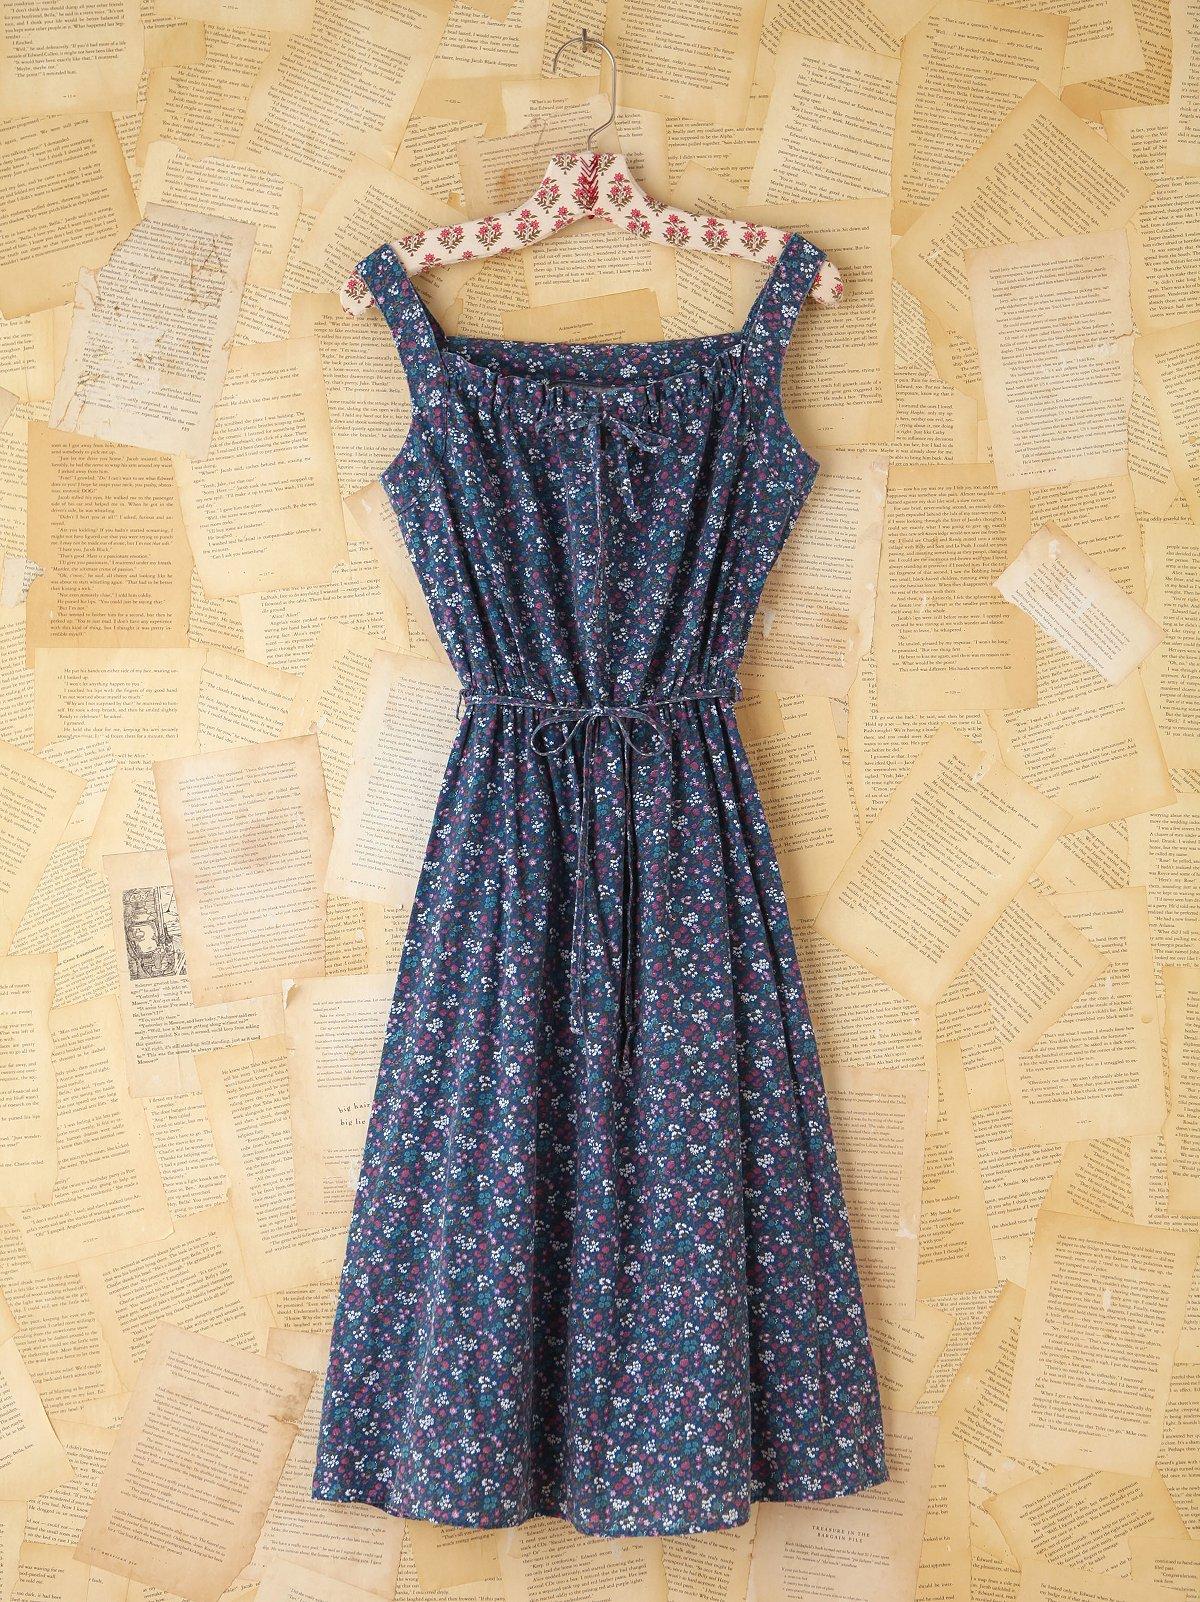 Vintage Blue Floral Printed Dress